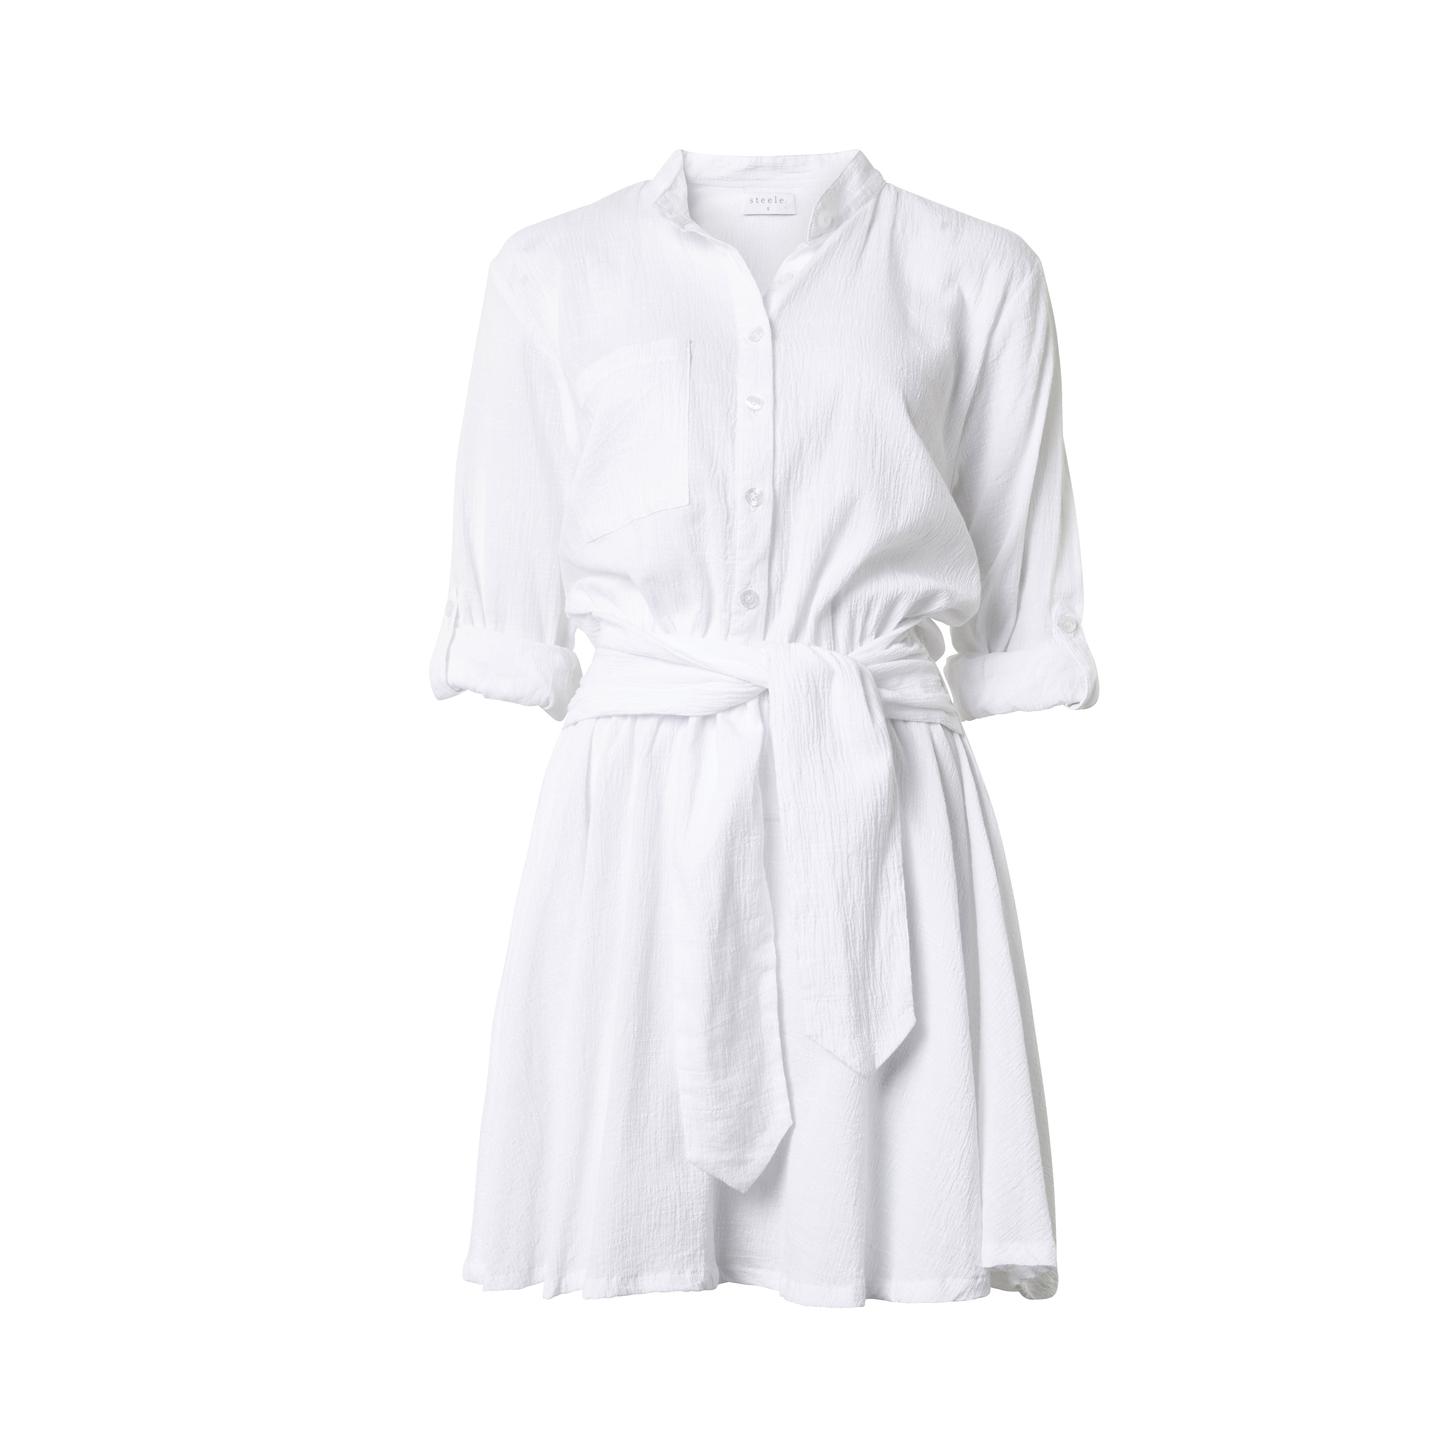 STEELE ANDREA WHITE DRESS